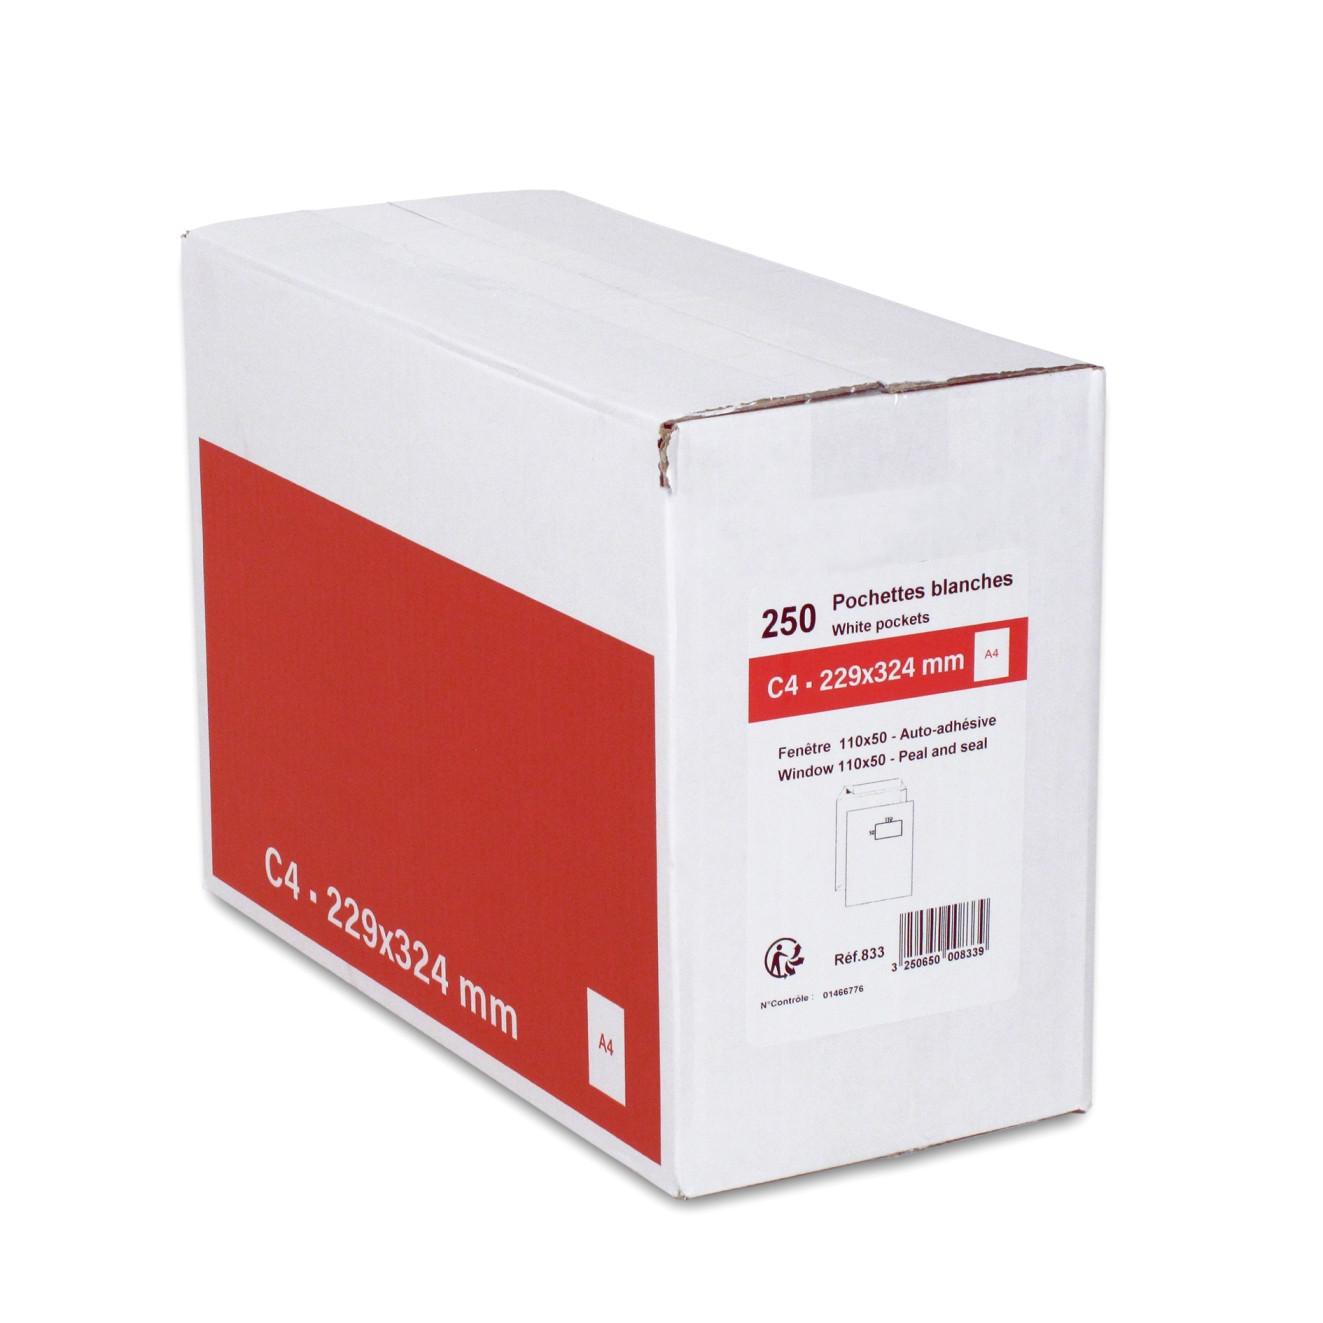 GPV - 250 Pochettes Enveloppes C4 229 x 324 mm - 90 gr - fenêtre 50x110 mm - blanc - bande adhésive